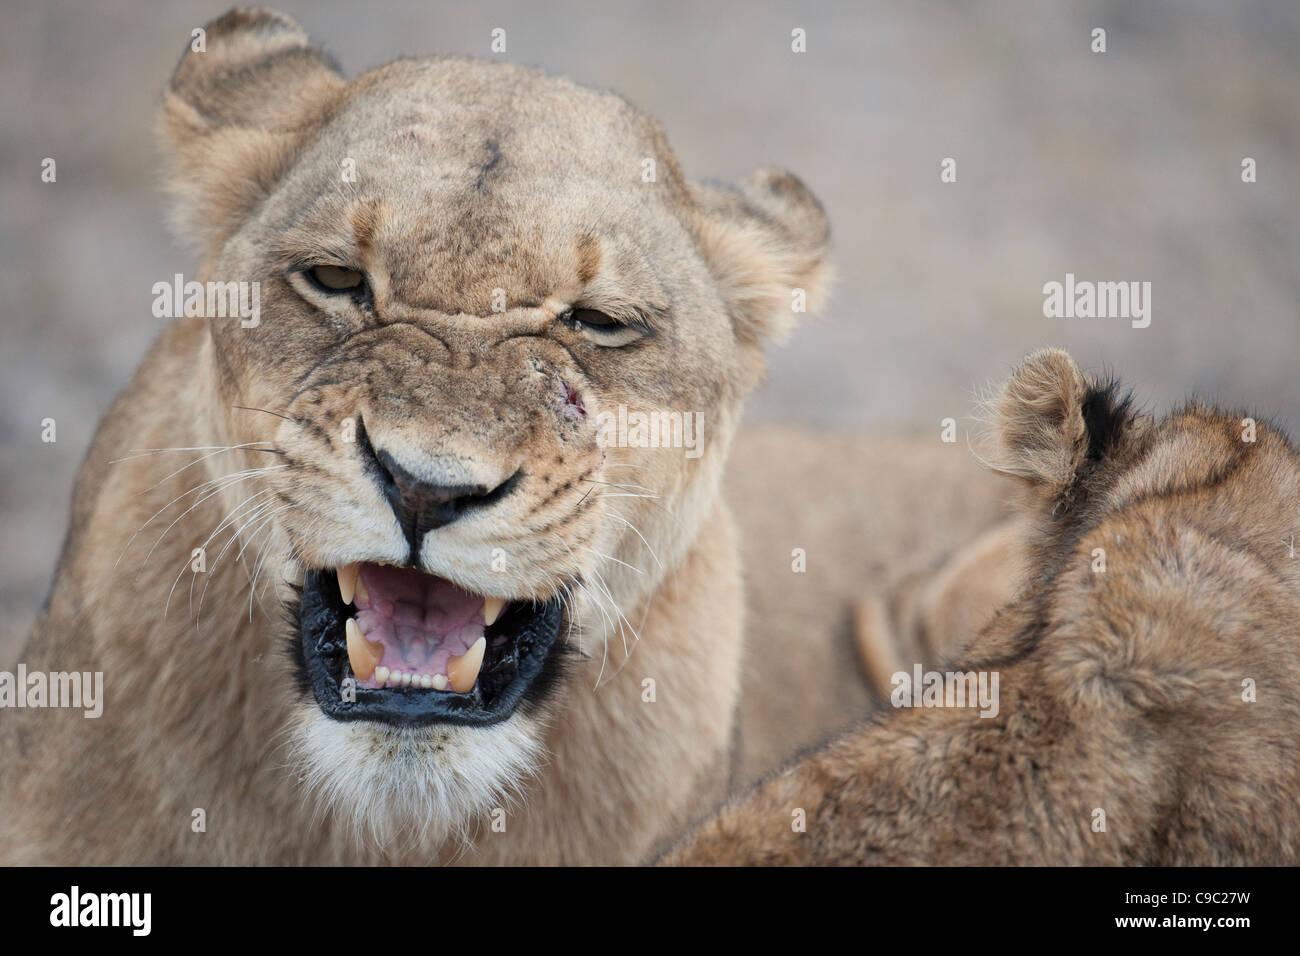 Lioness snarling at cub lion Panthera leo Botswana - Stock Image